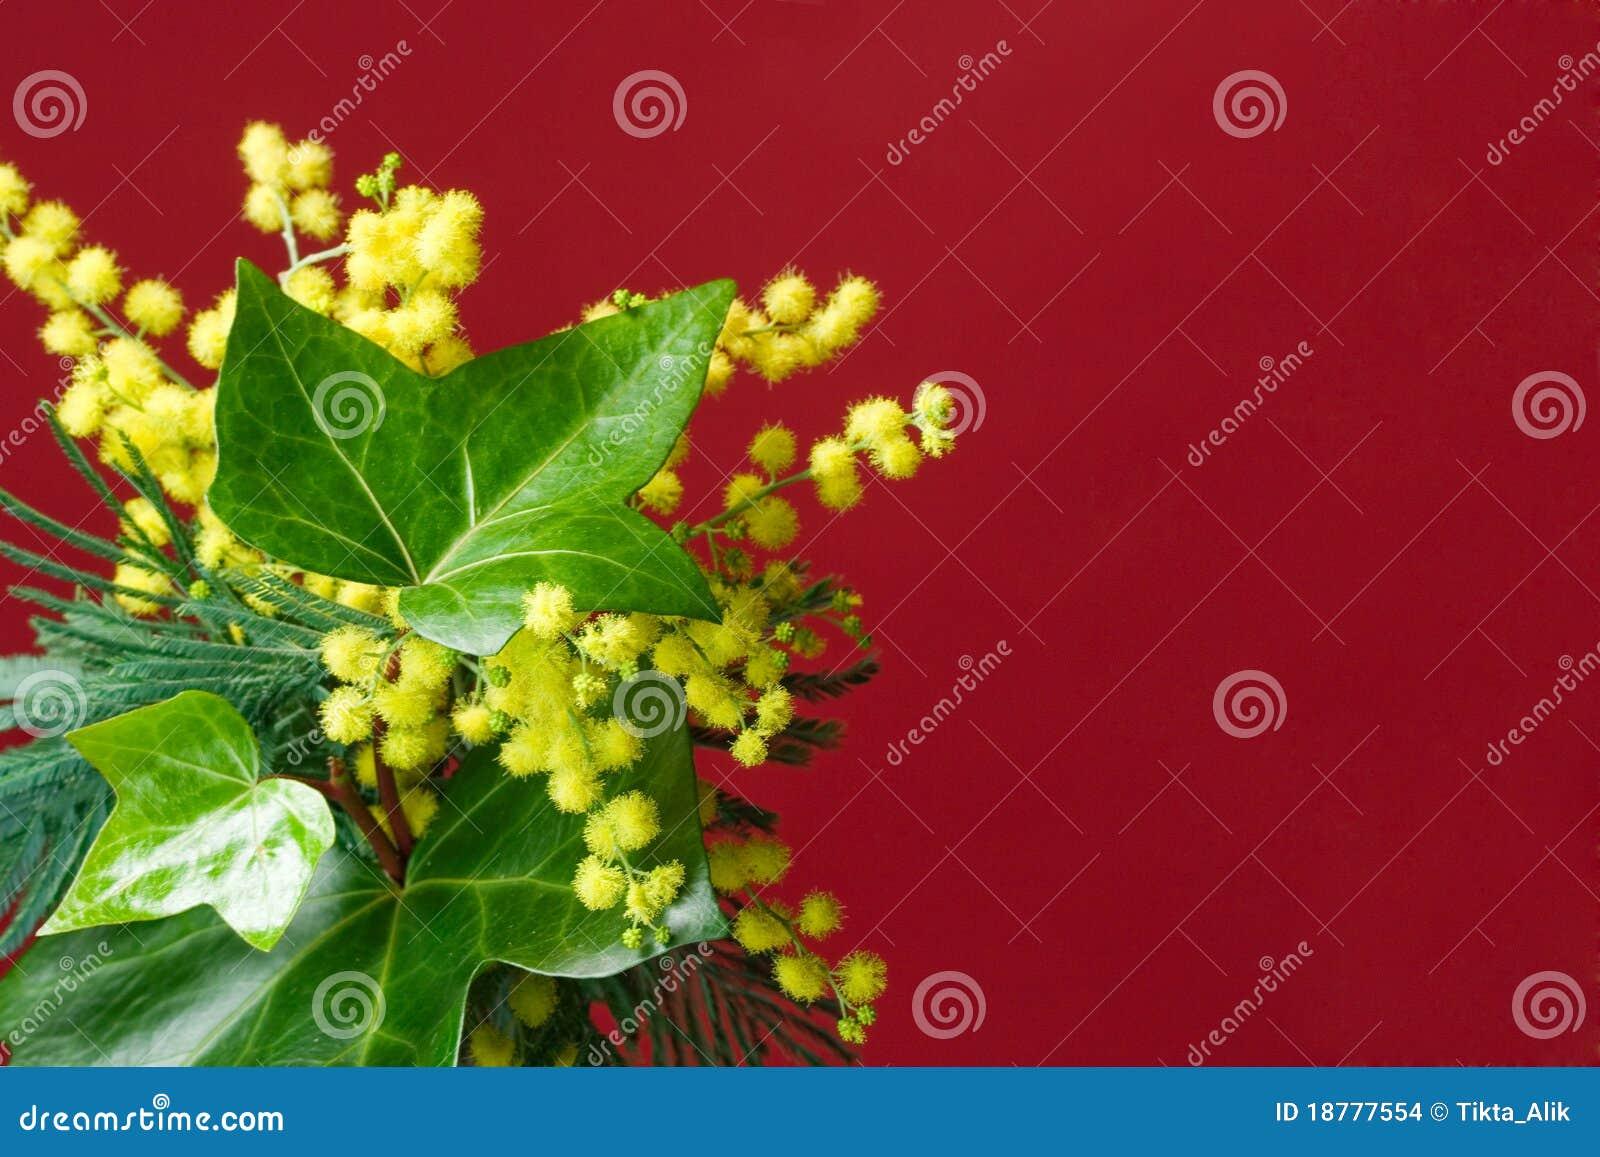 Mimosa And Ivy Spring Border Stock Photo Image Of Border Greeting